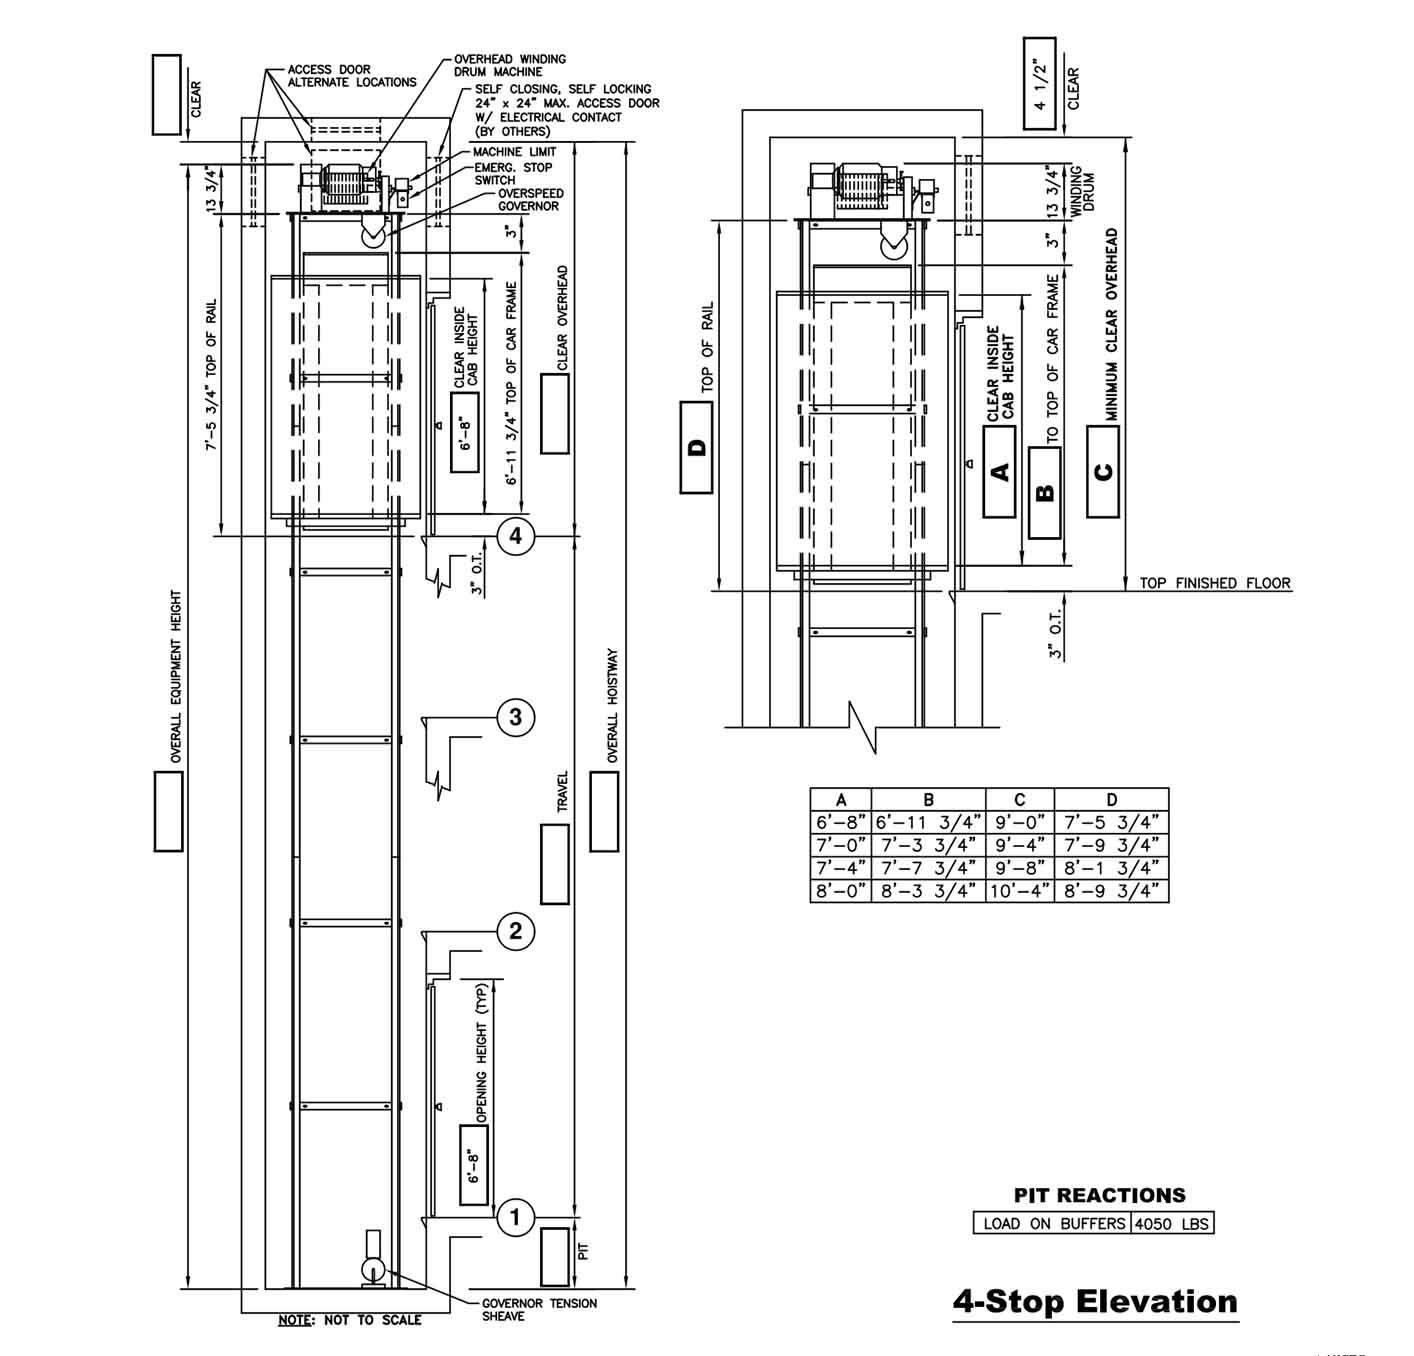 medium resolution of cable drive drawings custom elevator elevator house elevation roronoa zoro crossword